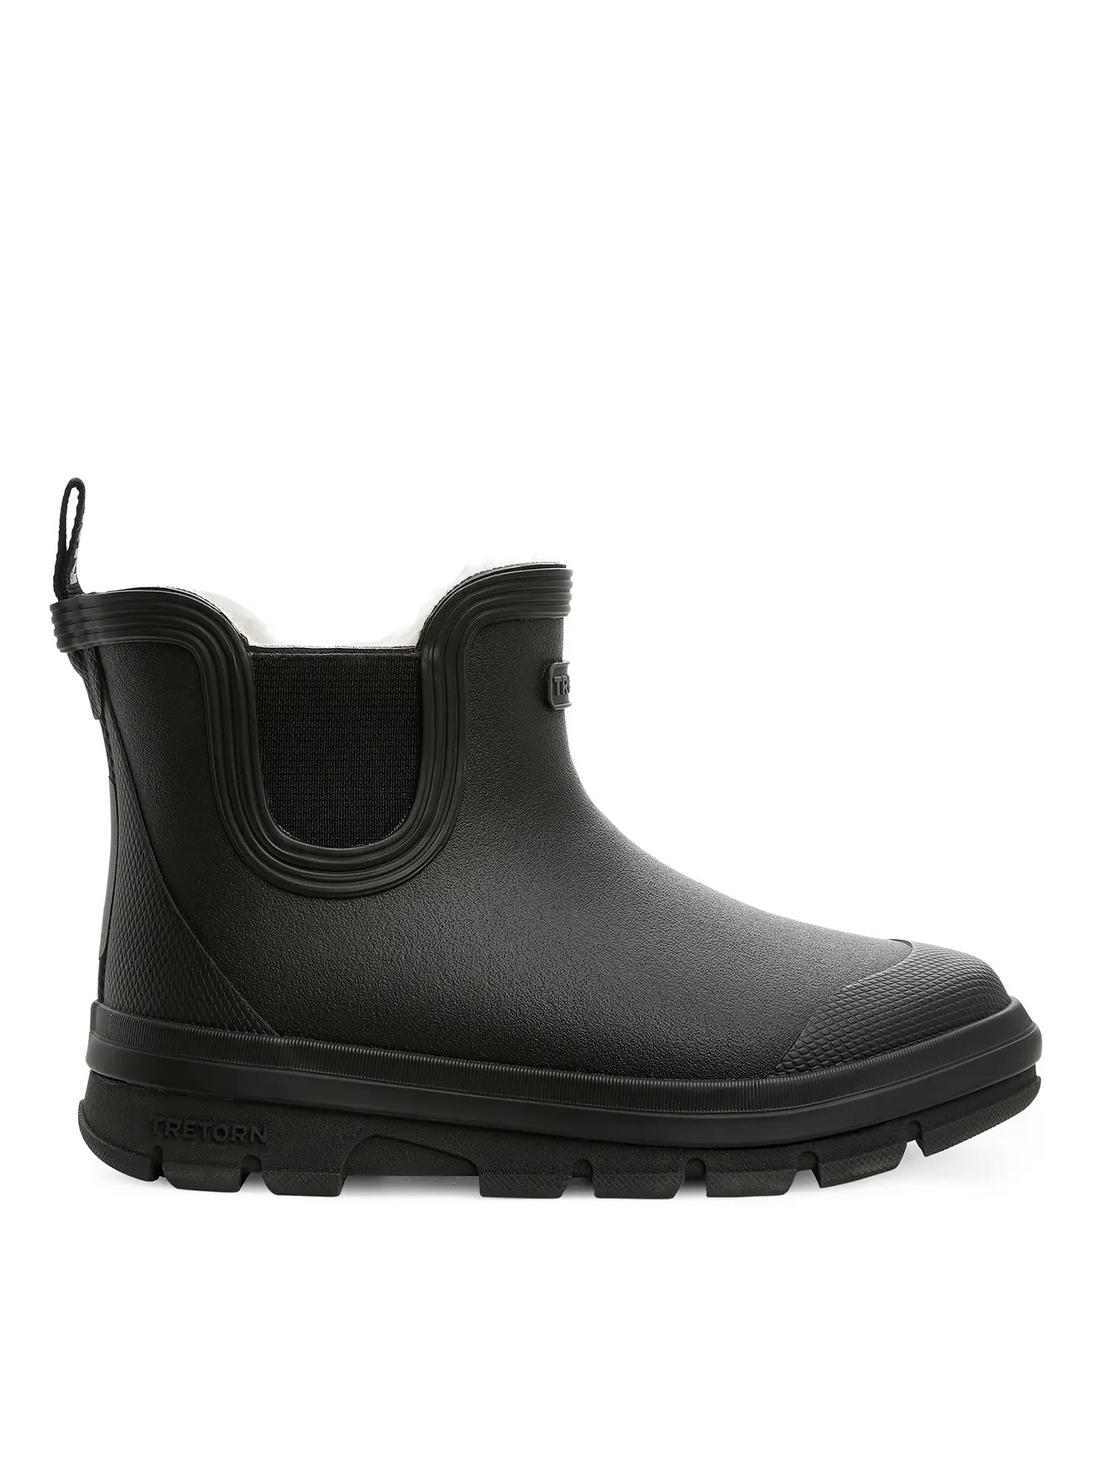 TRETORN Winter Chelsea Boots